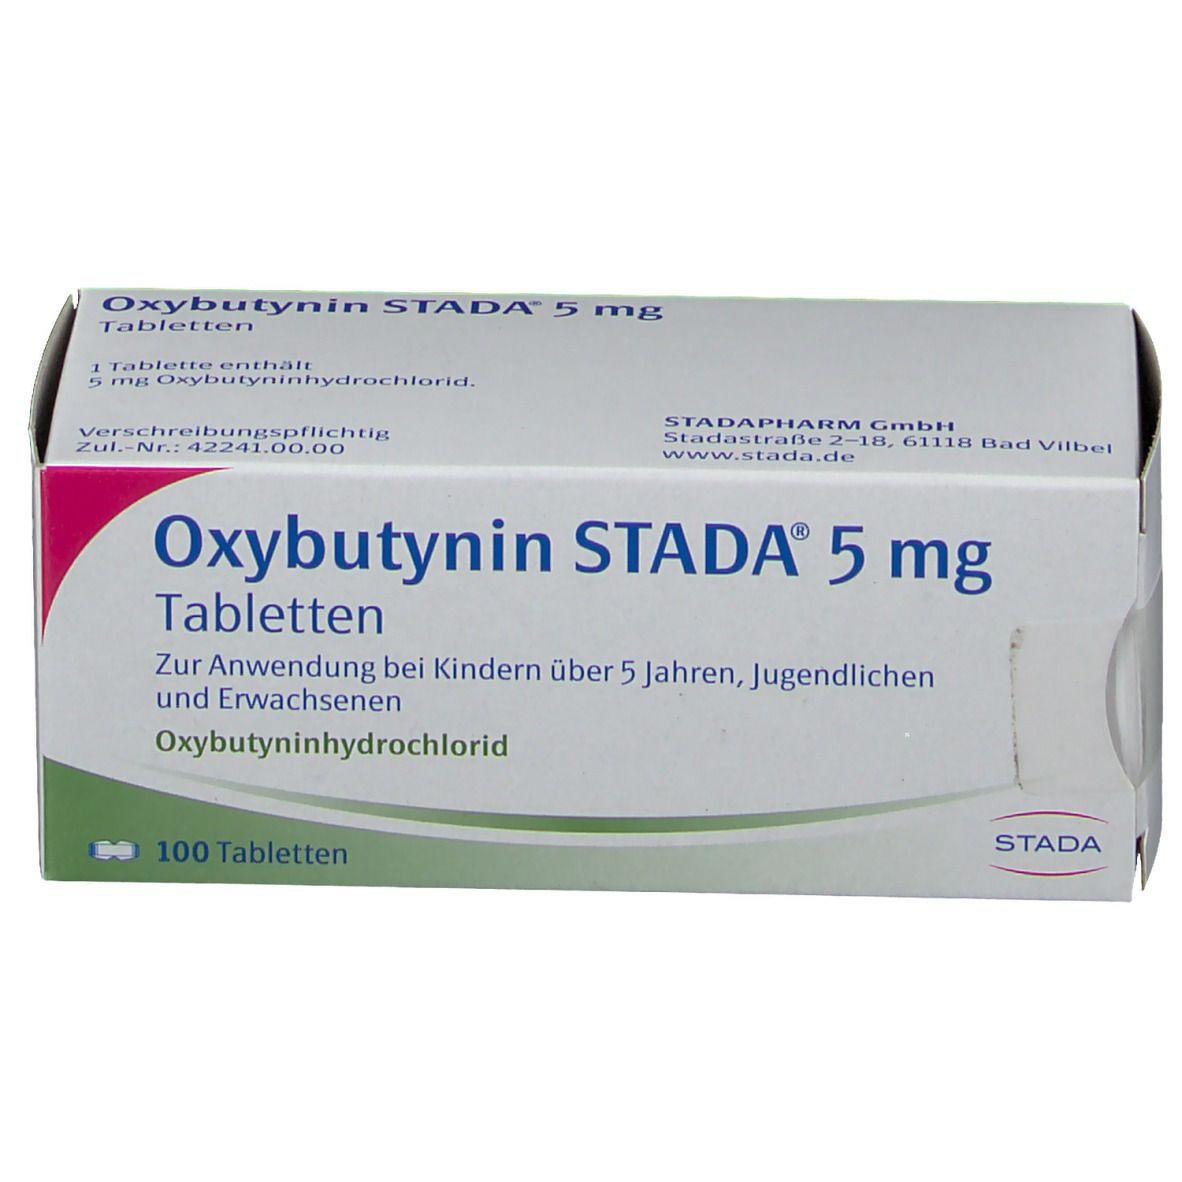 Oxybutynin Stada® 5 mg Tabletten 100 St - shop-apotheke.com